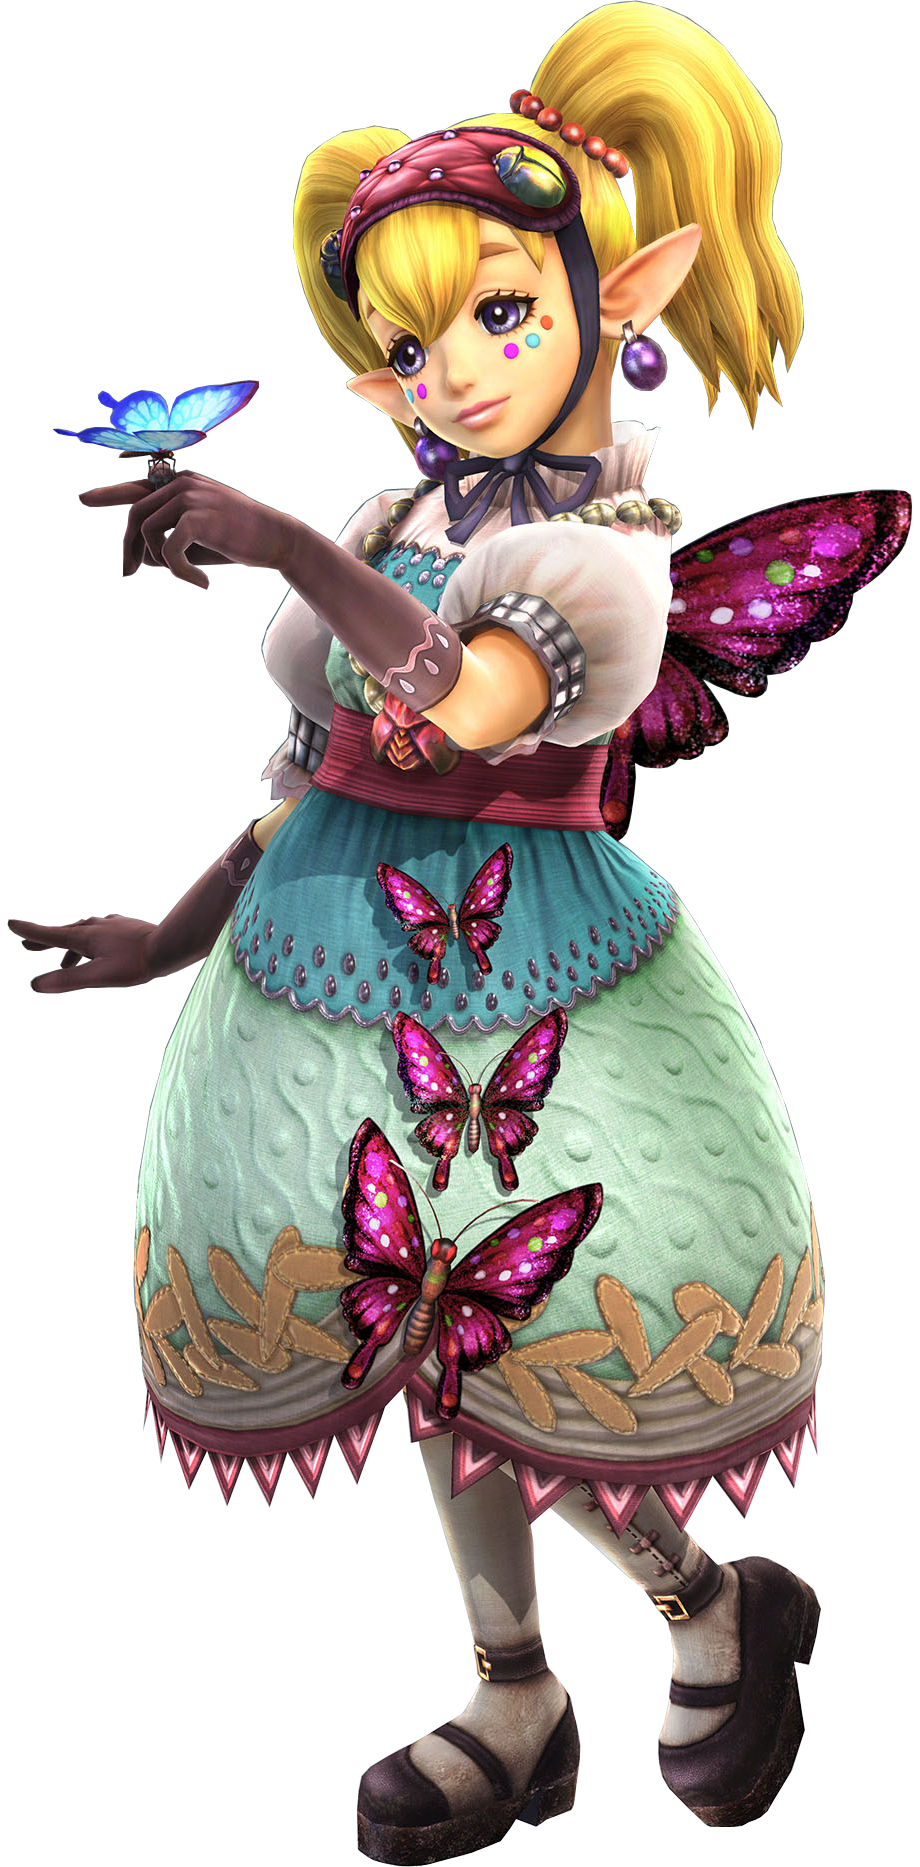 Agitha Hyrule Warriors Zeldapedia Fandom Powered By Wikia